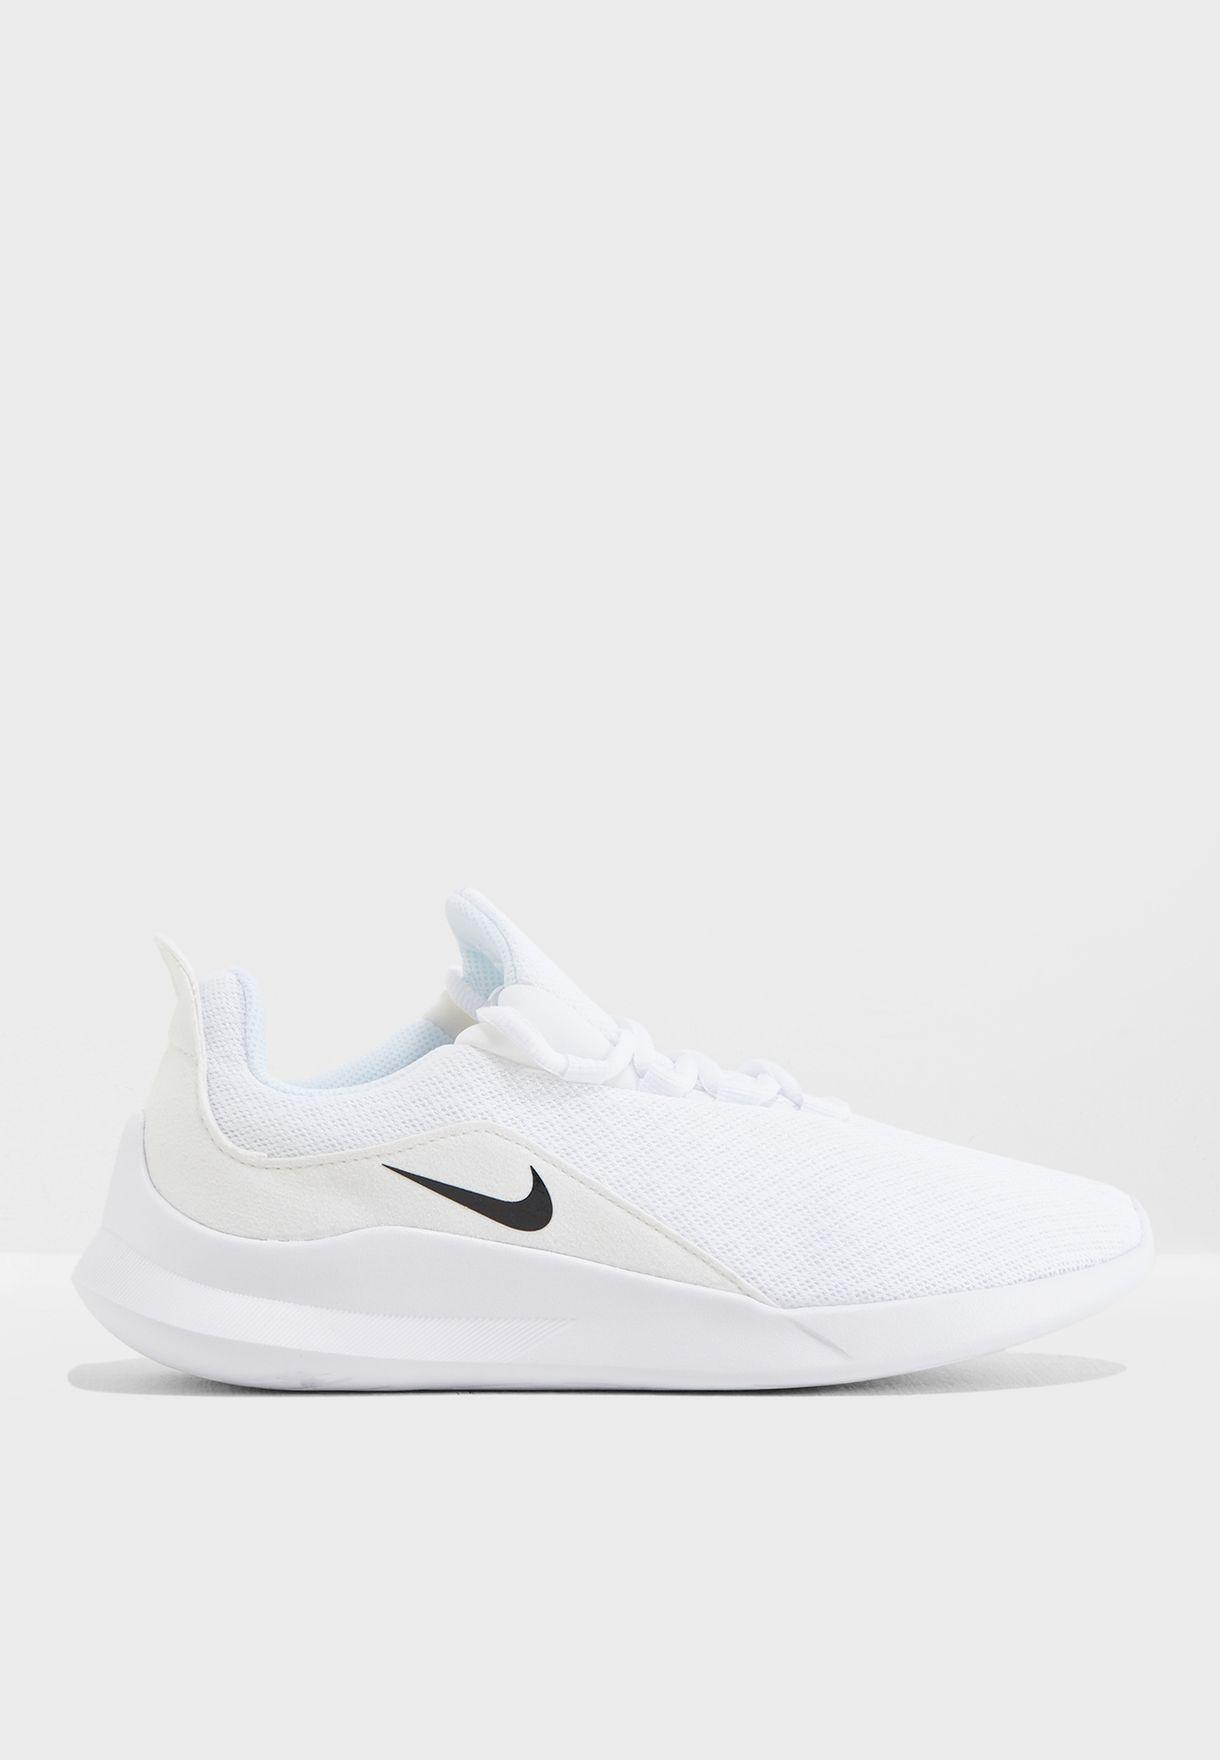 755dceb7f تسوق حذاء فيالي ماركة نايك لون أبيض AA2185-100 في السعودية ...